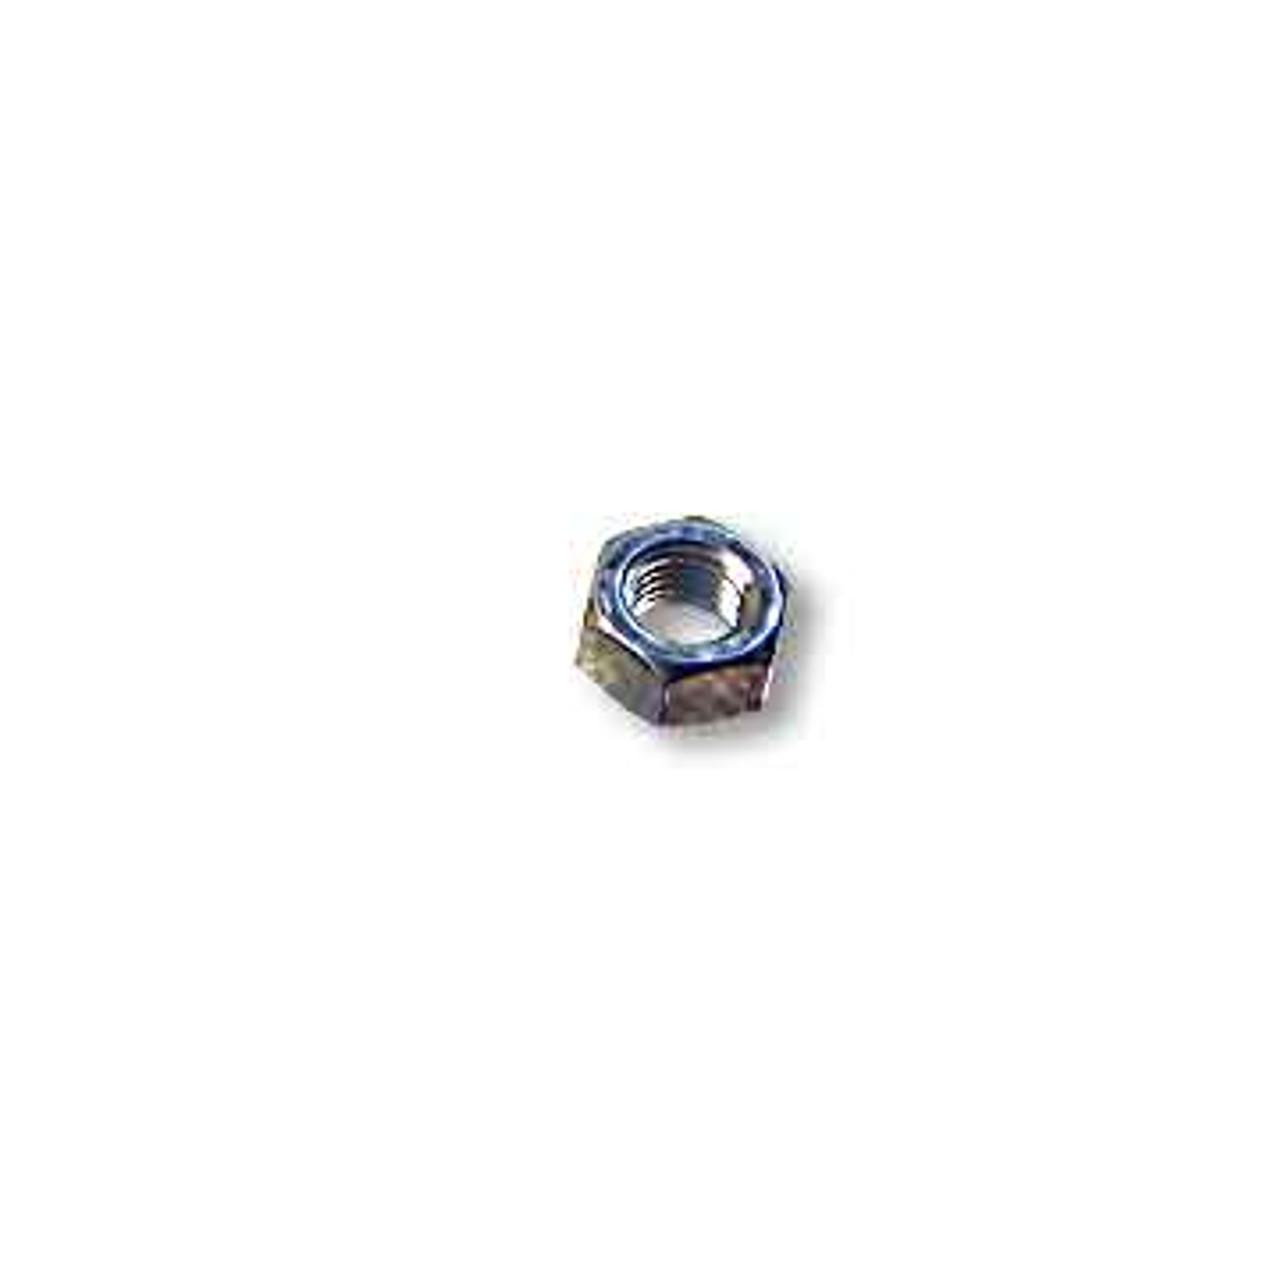 Hex Nut, 5/16-18, Zinc Plated